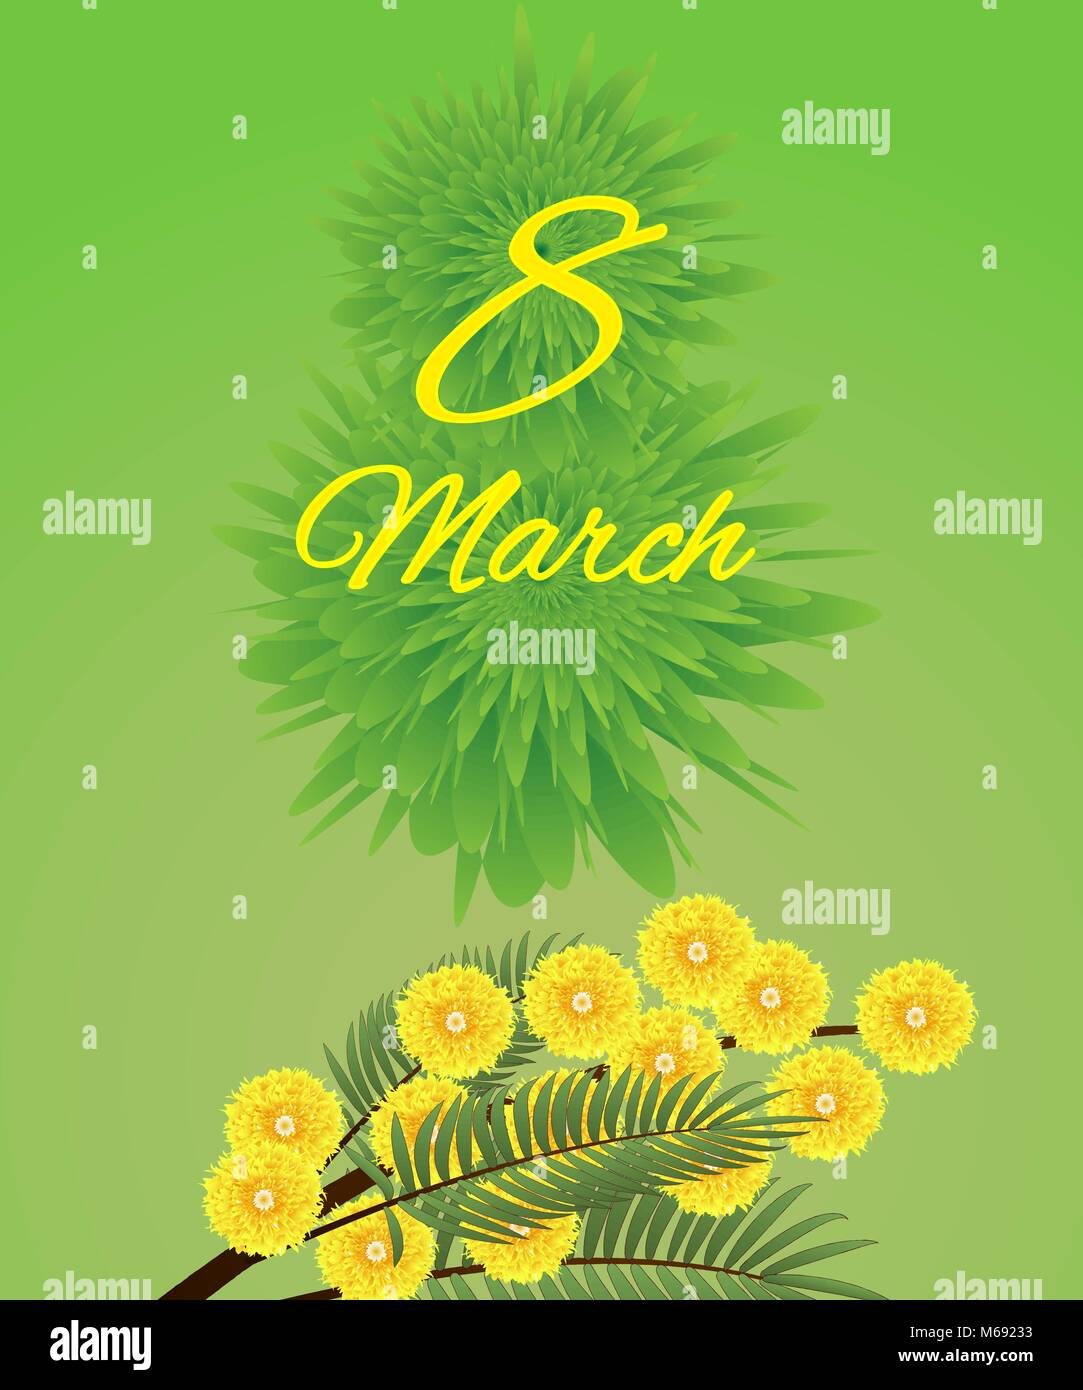 International womens day greeting card bright spring banner stock international womens day greeting card bright spring banner creative vector illustration m4hsunfo